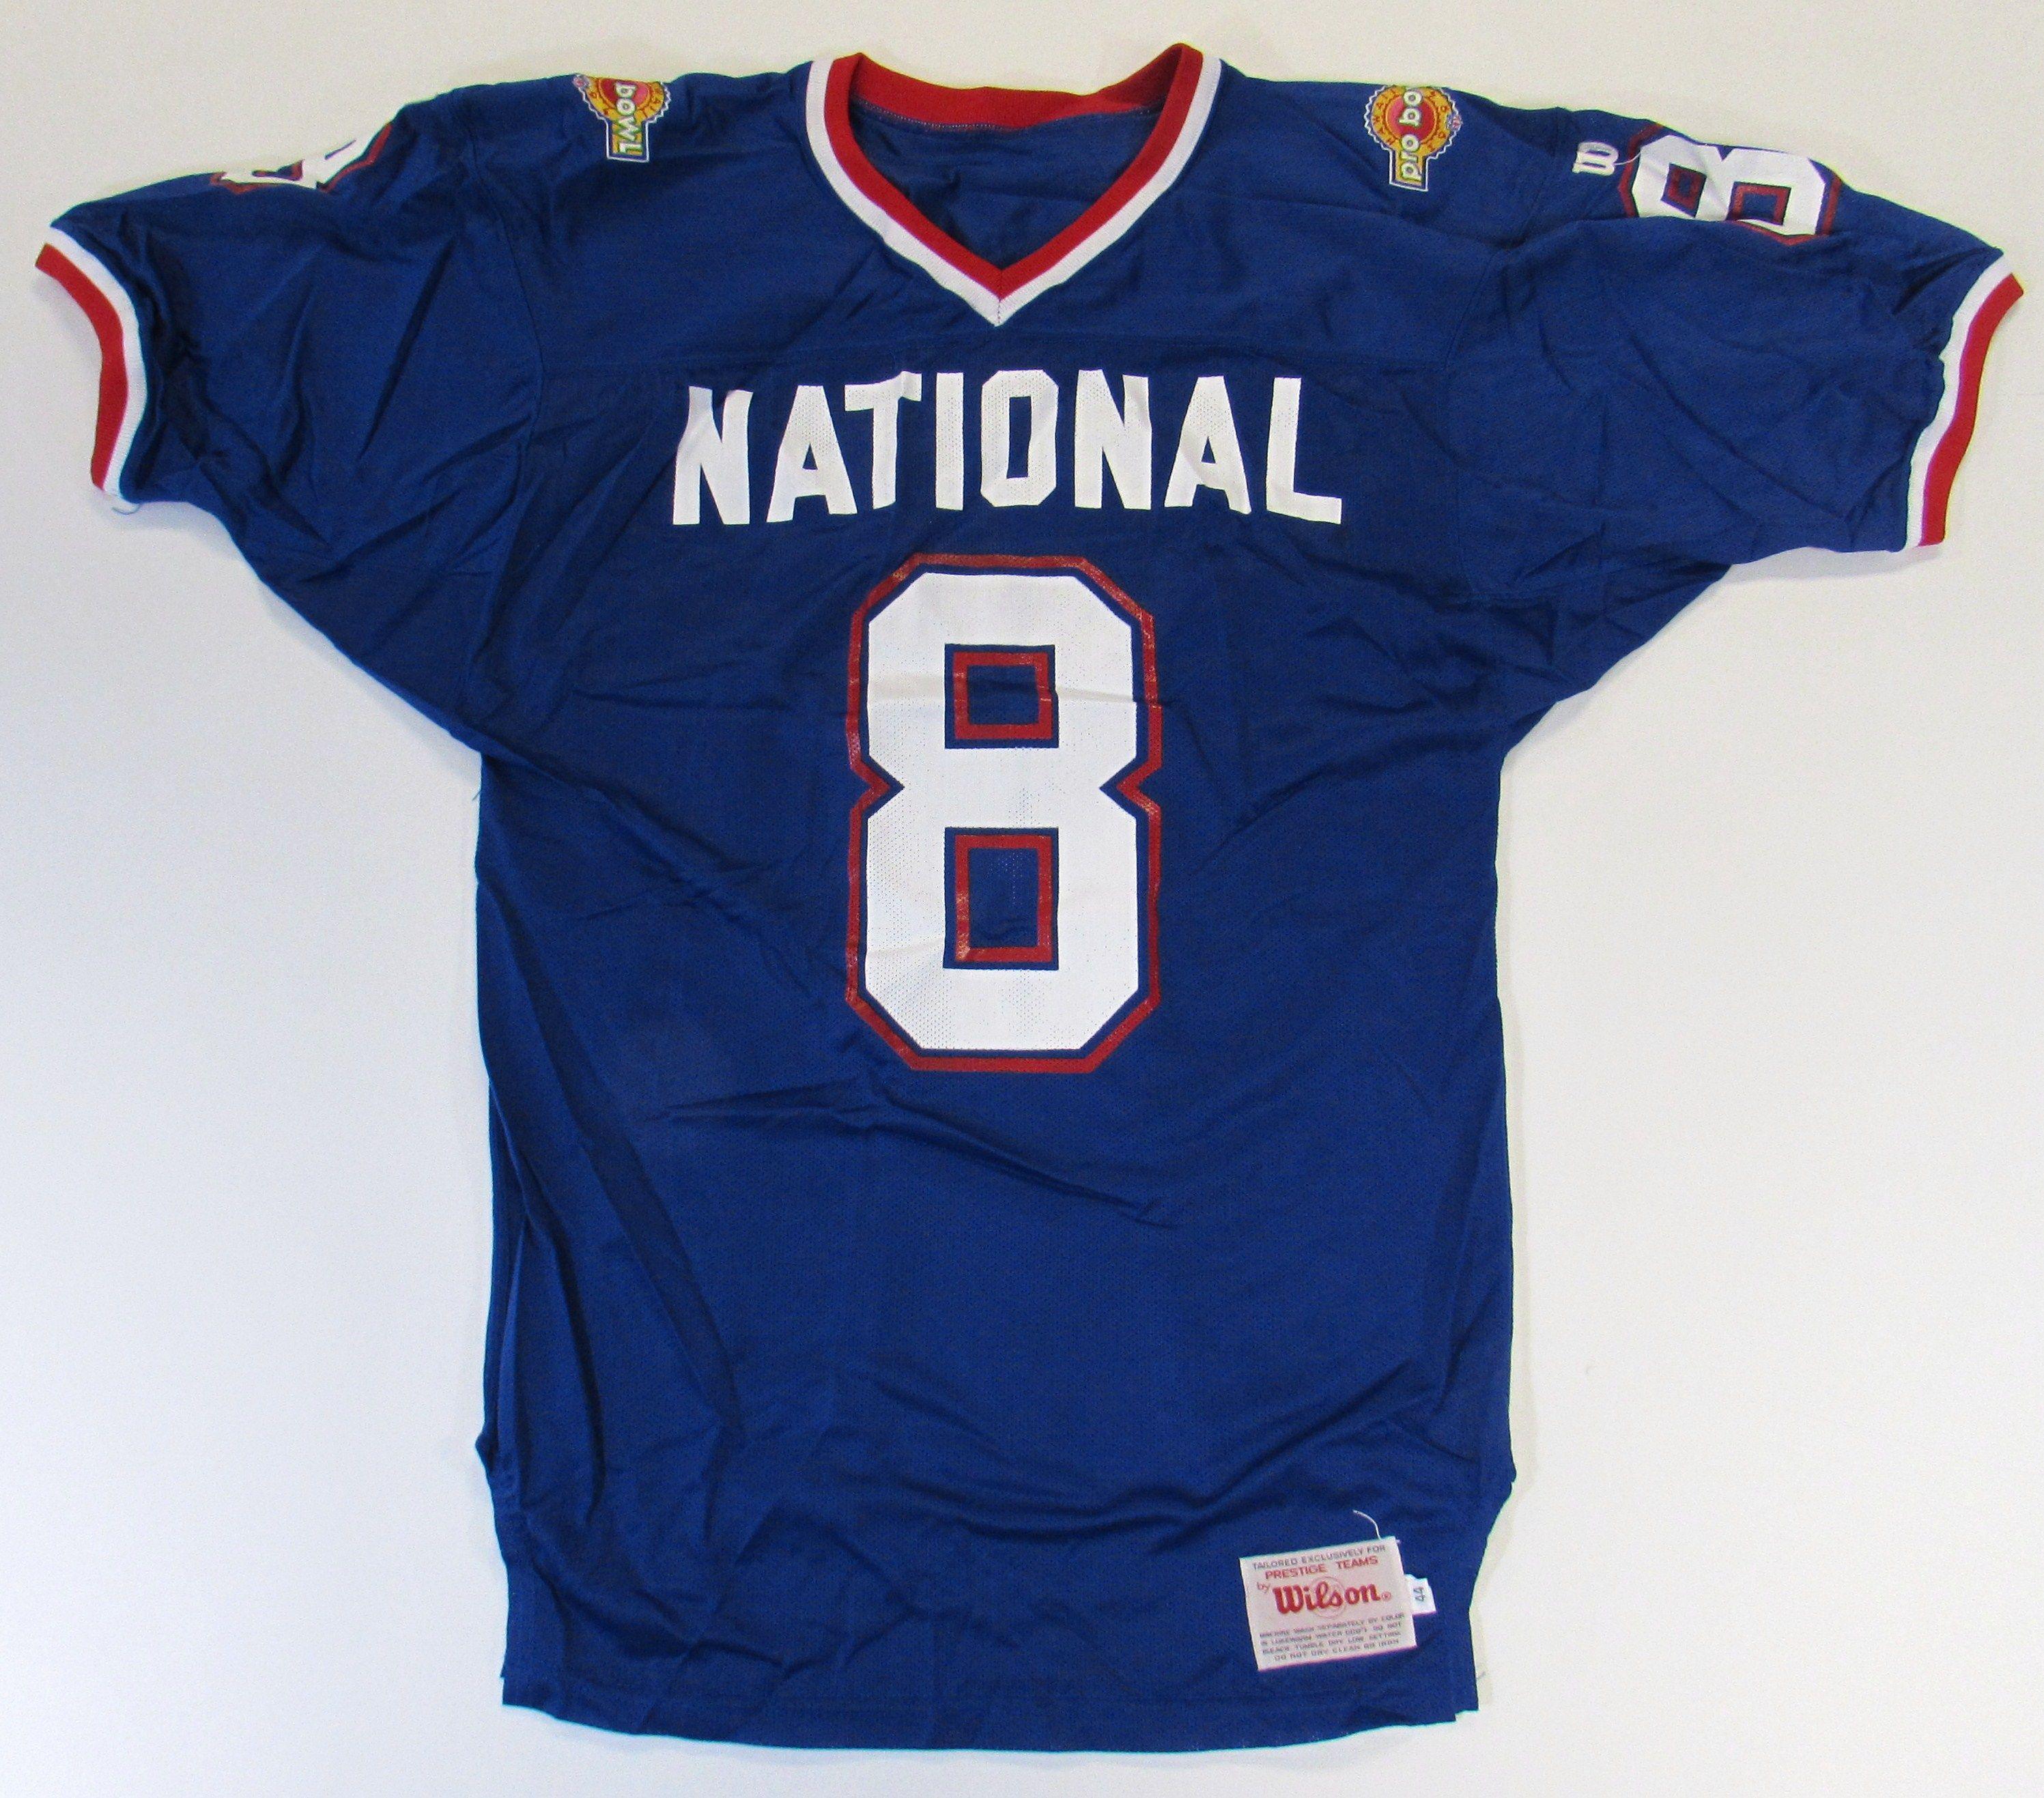 timeless design 87e50 8bede Lot Detail - 1994 Steve Young Signed GI Pro Bowl Jersey